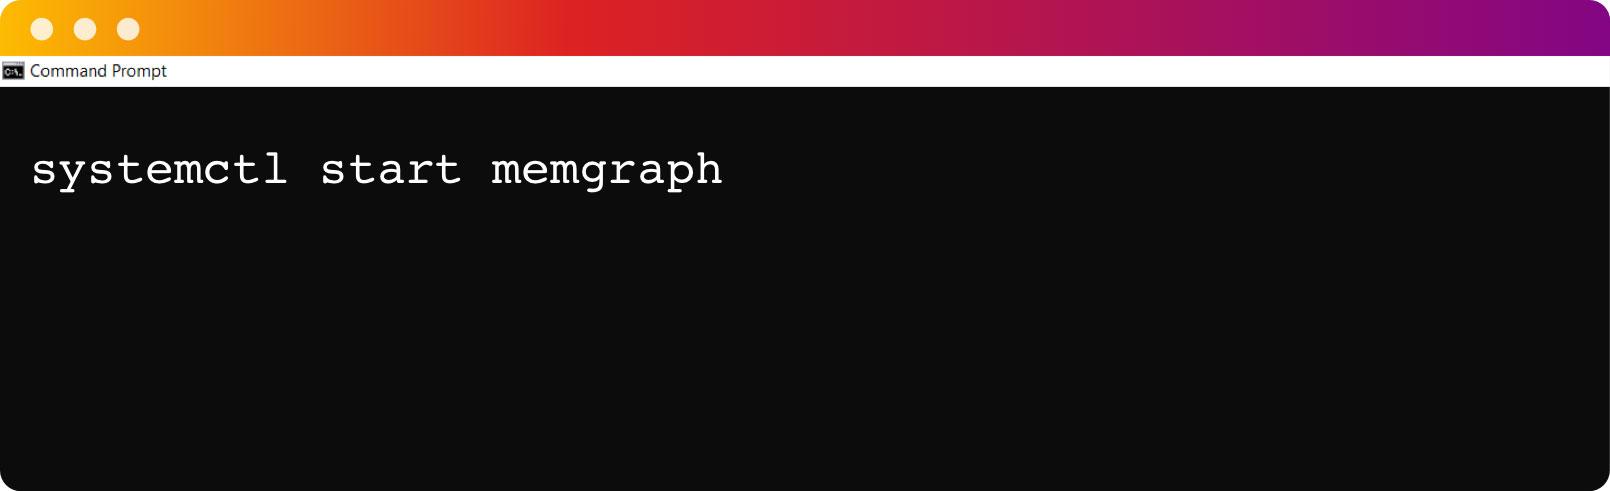 Memgraph installation step 2 RPM